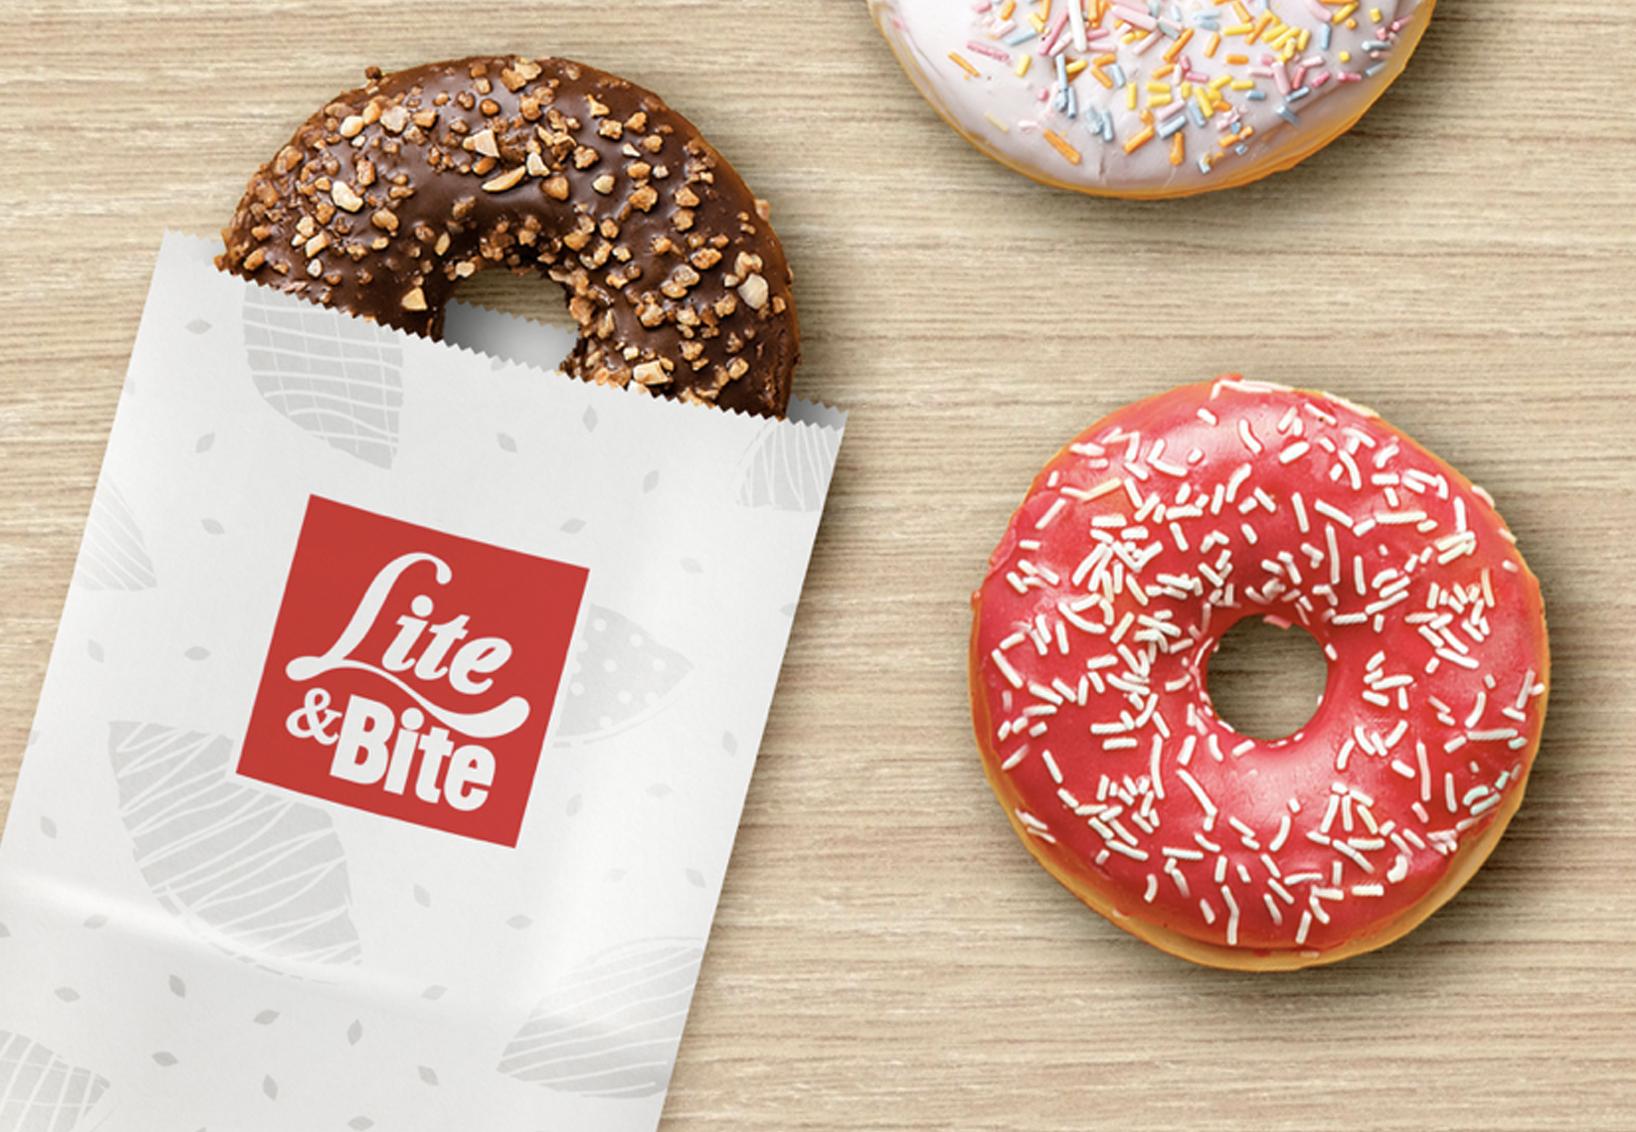 Lite & Bite Packaging